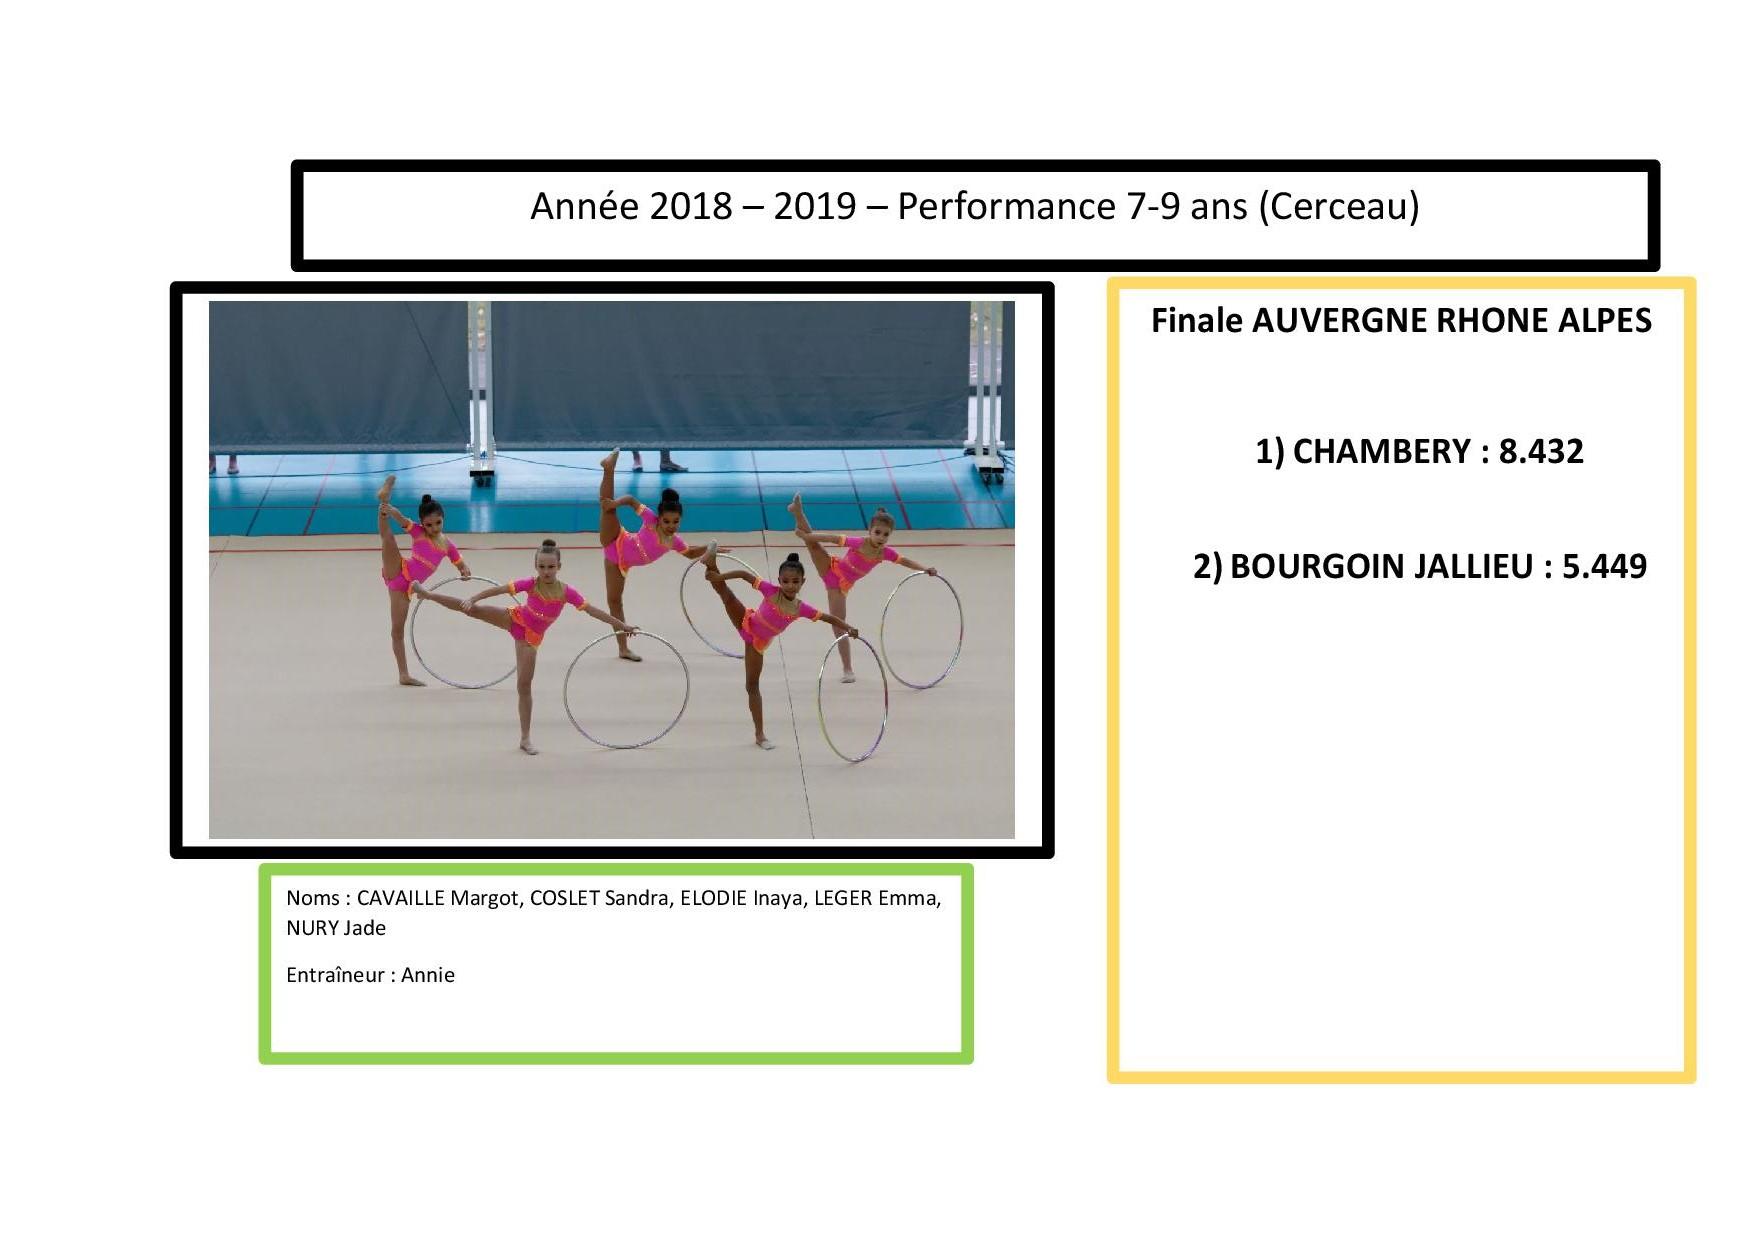 39 Document trombinoscope-Performance 7-9ans